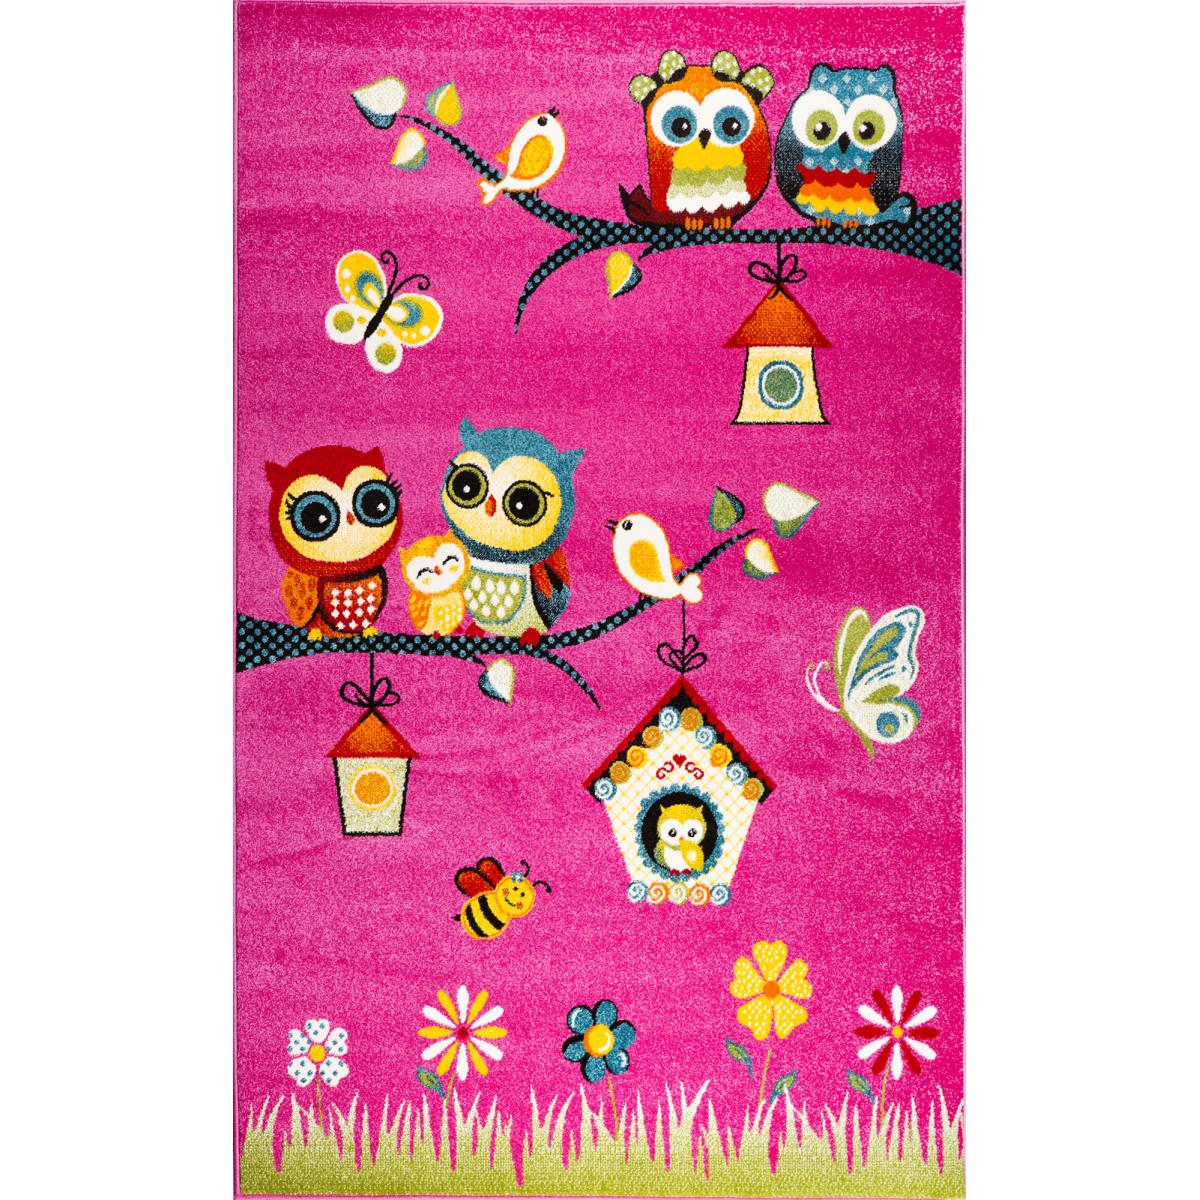 Ковёр Art Kids LM05 1.5x2.3 м цвет розовый